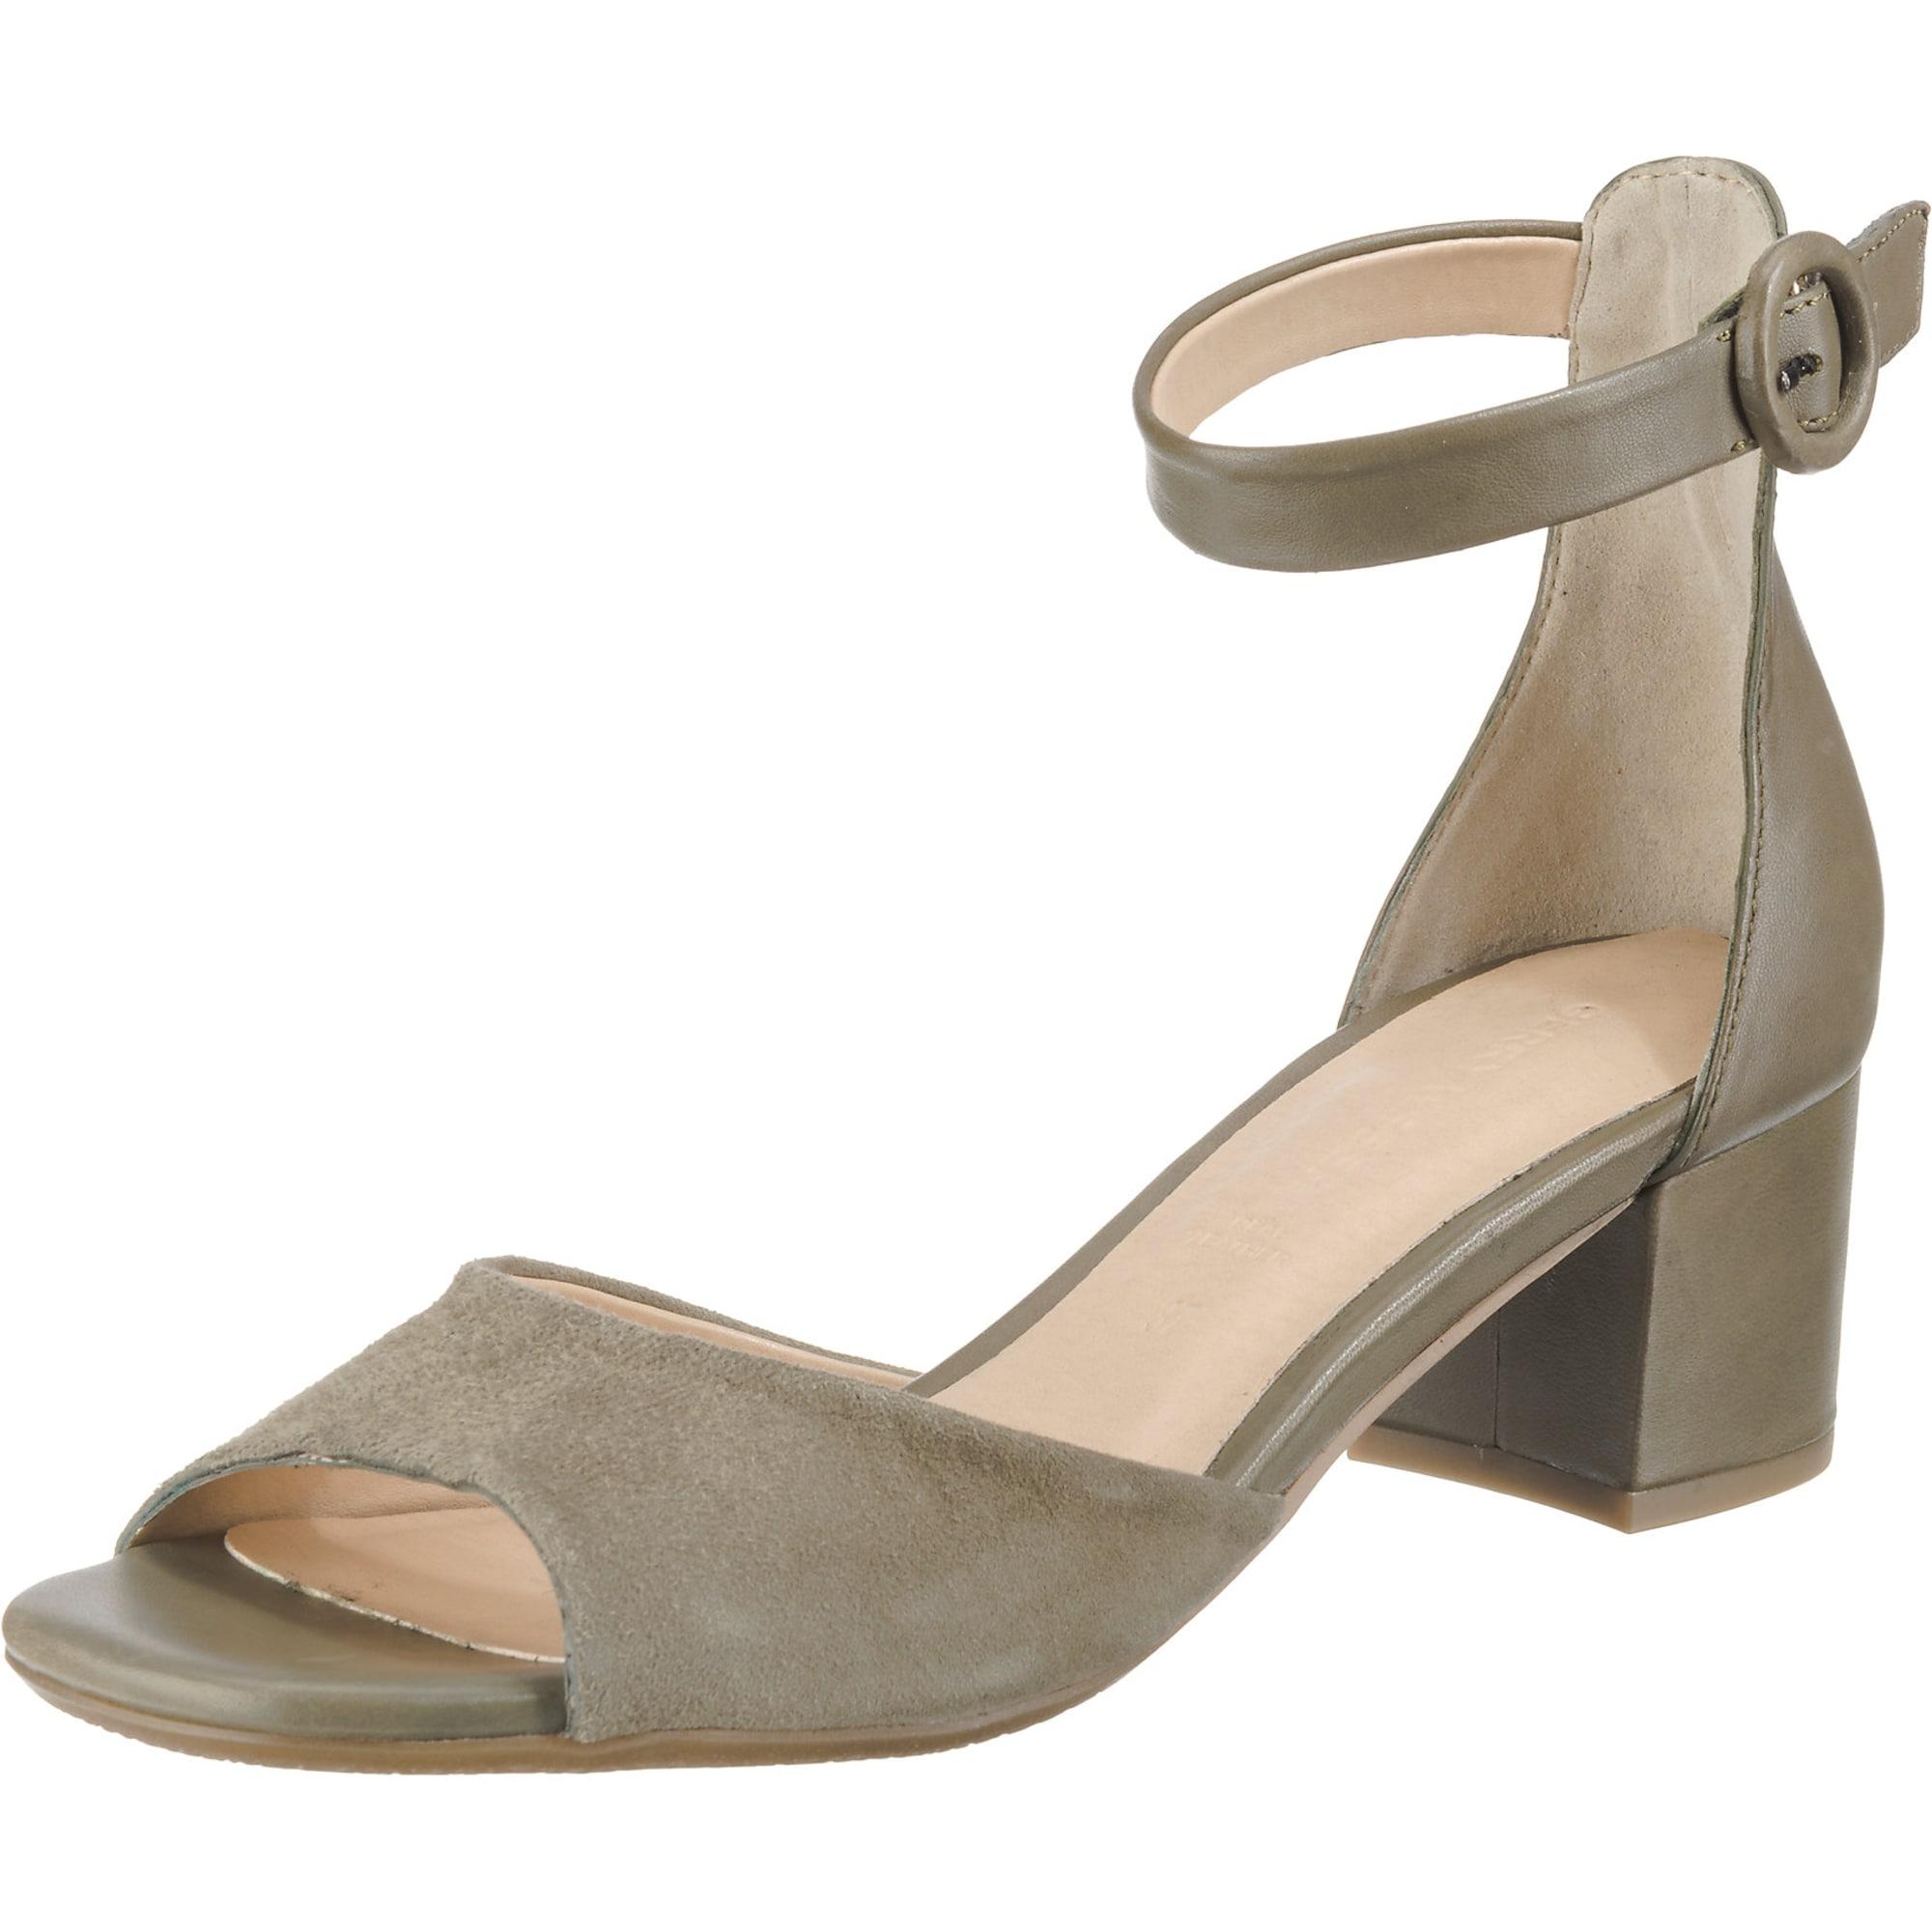 gerry weber - Sandaletten